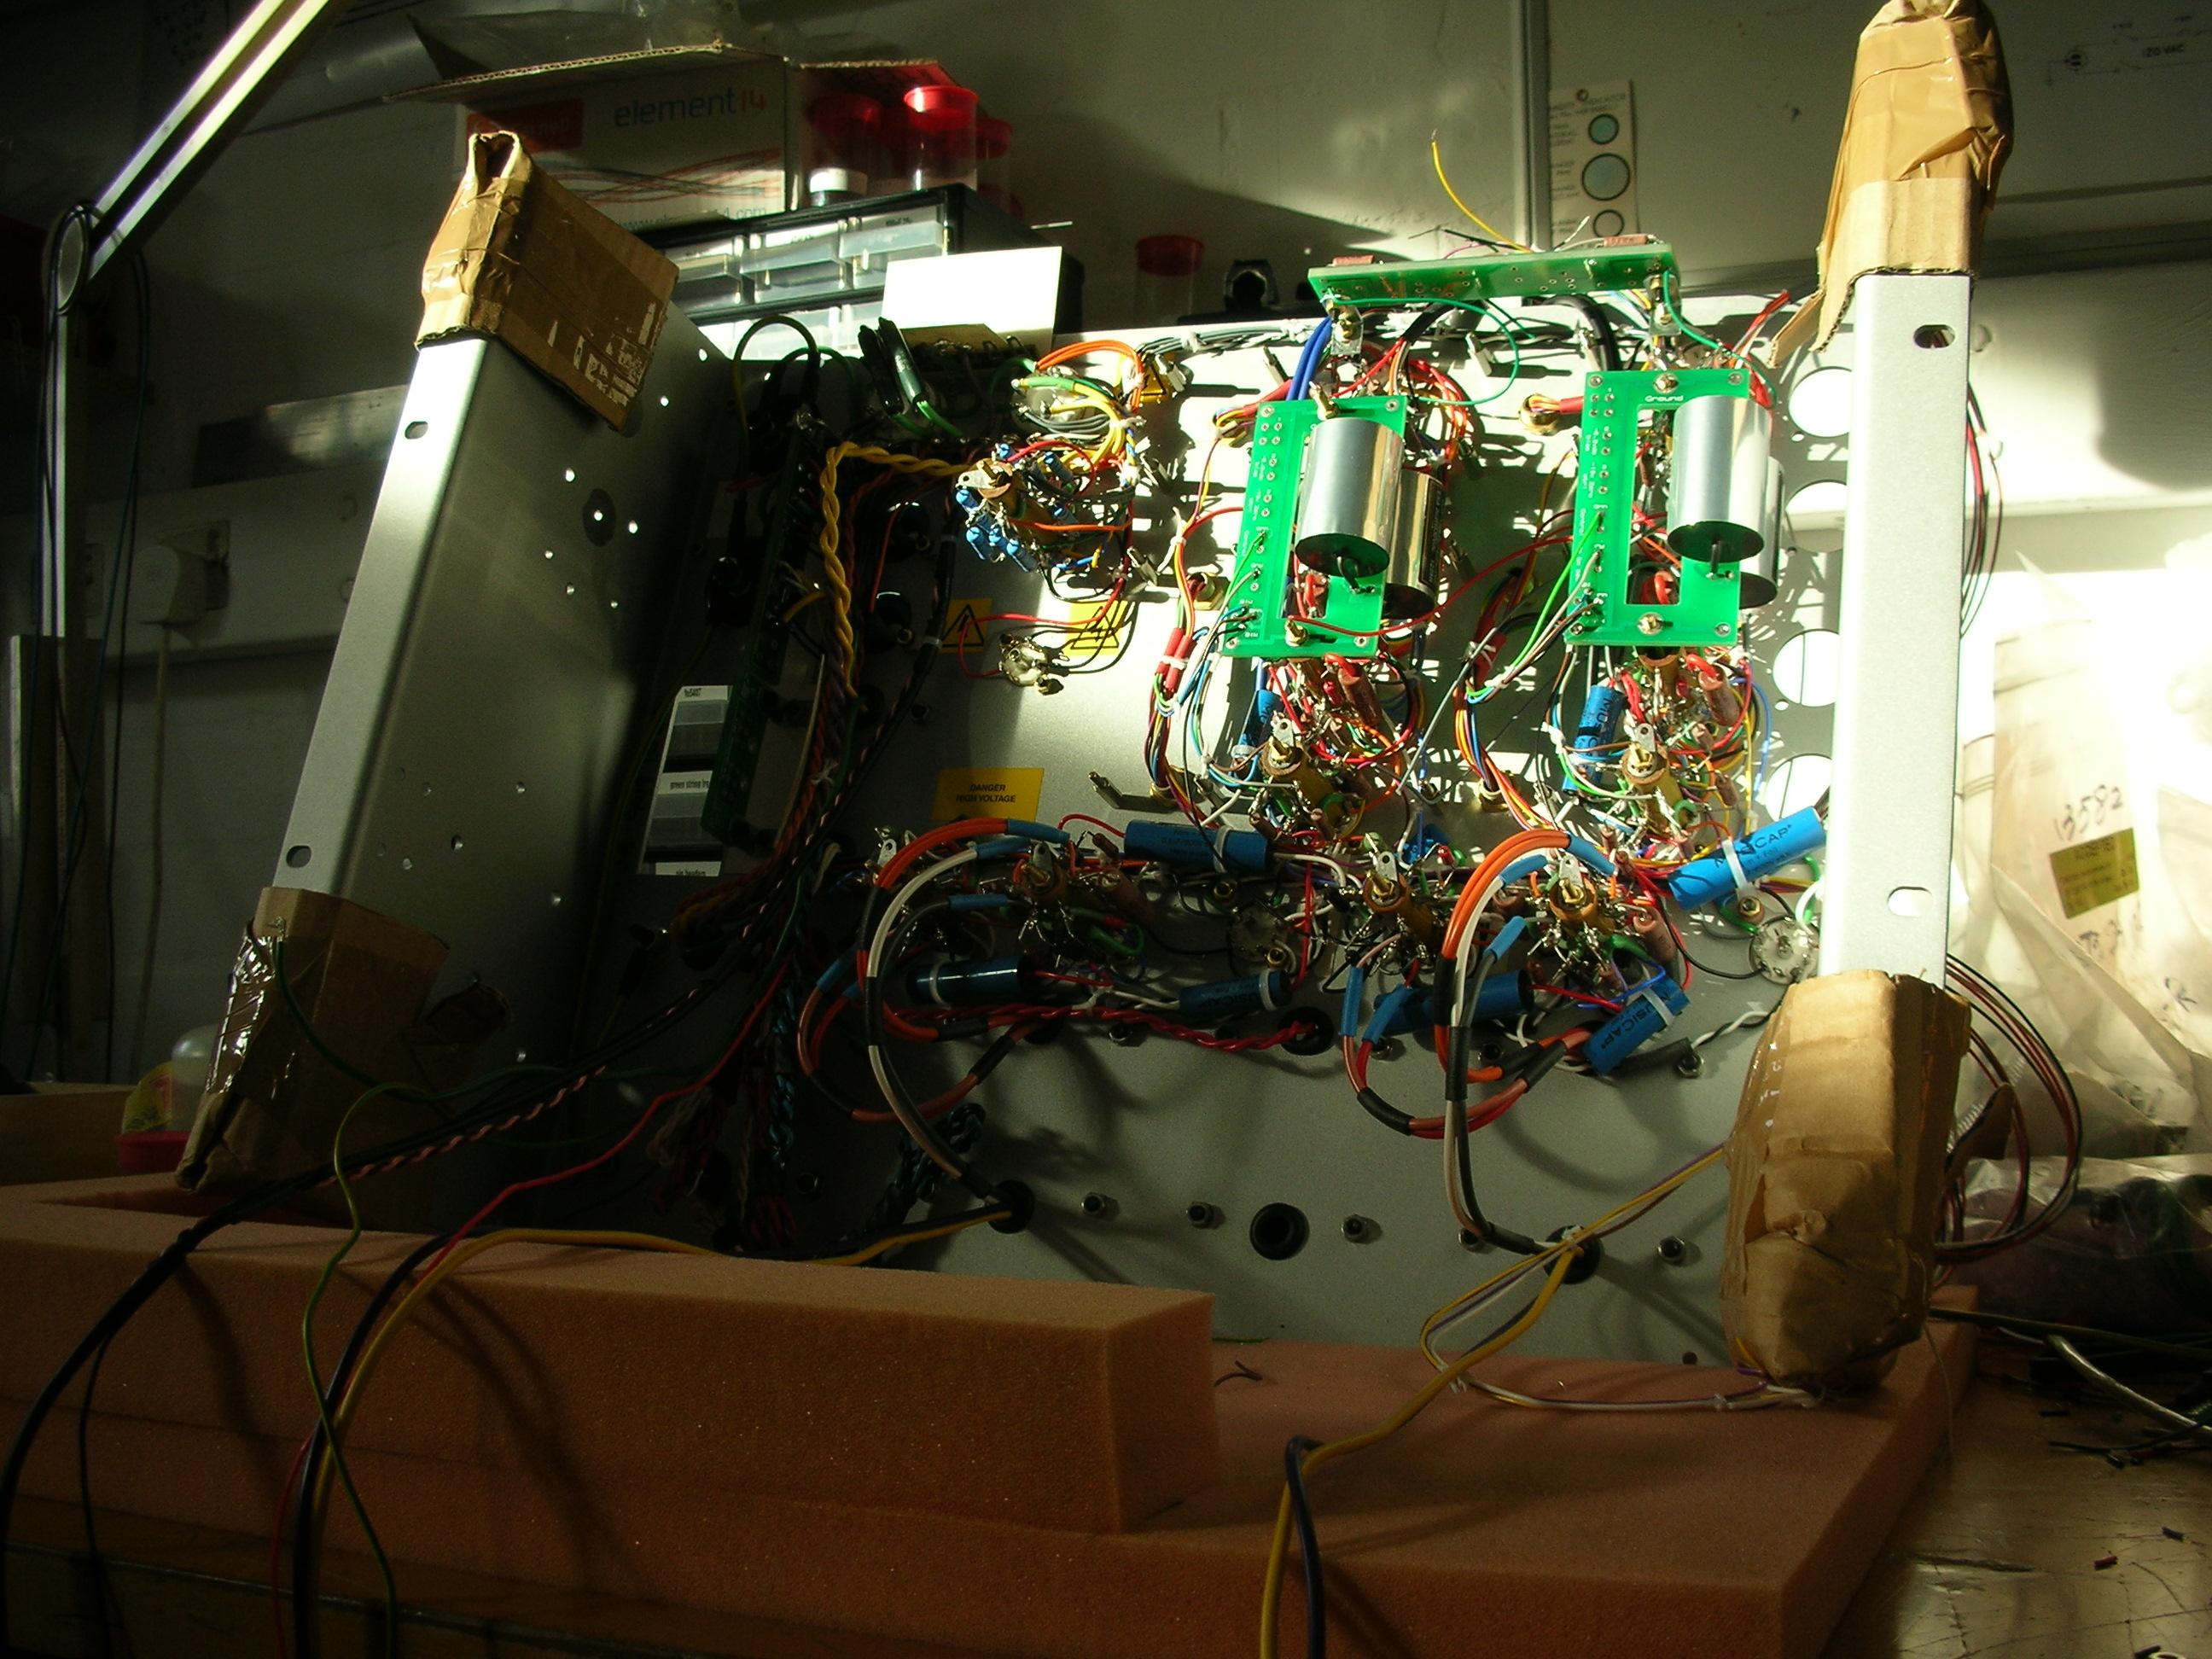 Pre Productio Internal AT-101